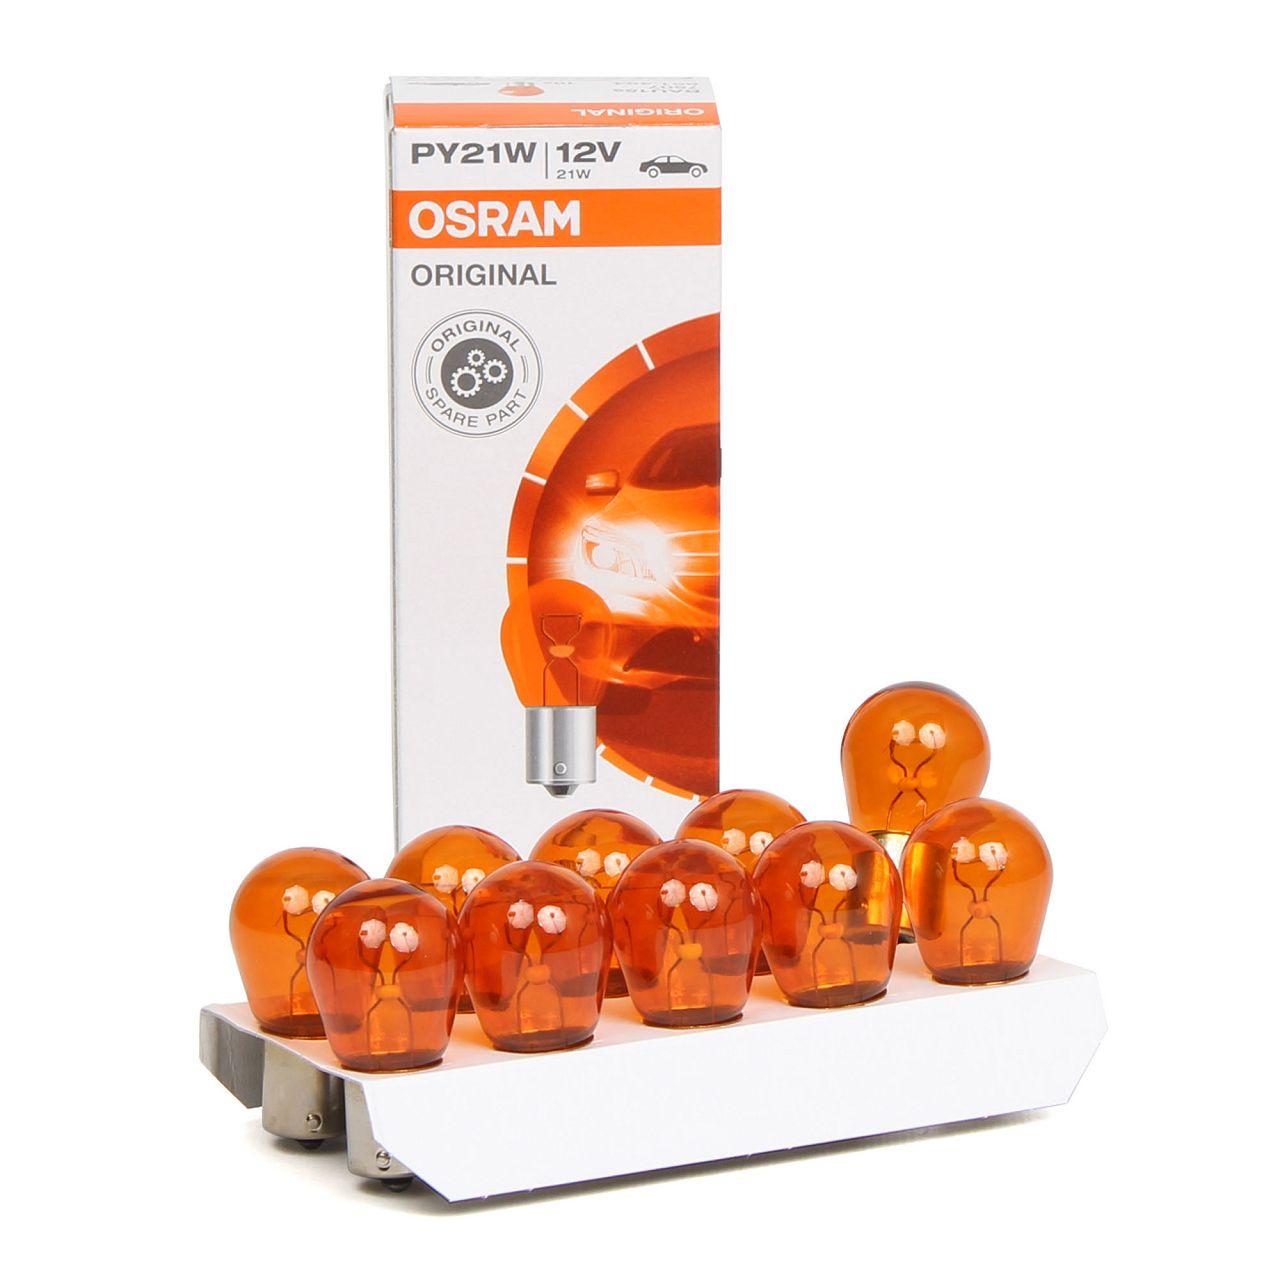 10x OSRAM 7507 Glühlampe Sockelglühlampe PY21W ORIGINAL-Line 12V 21W BAU15s